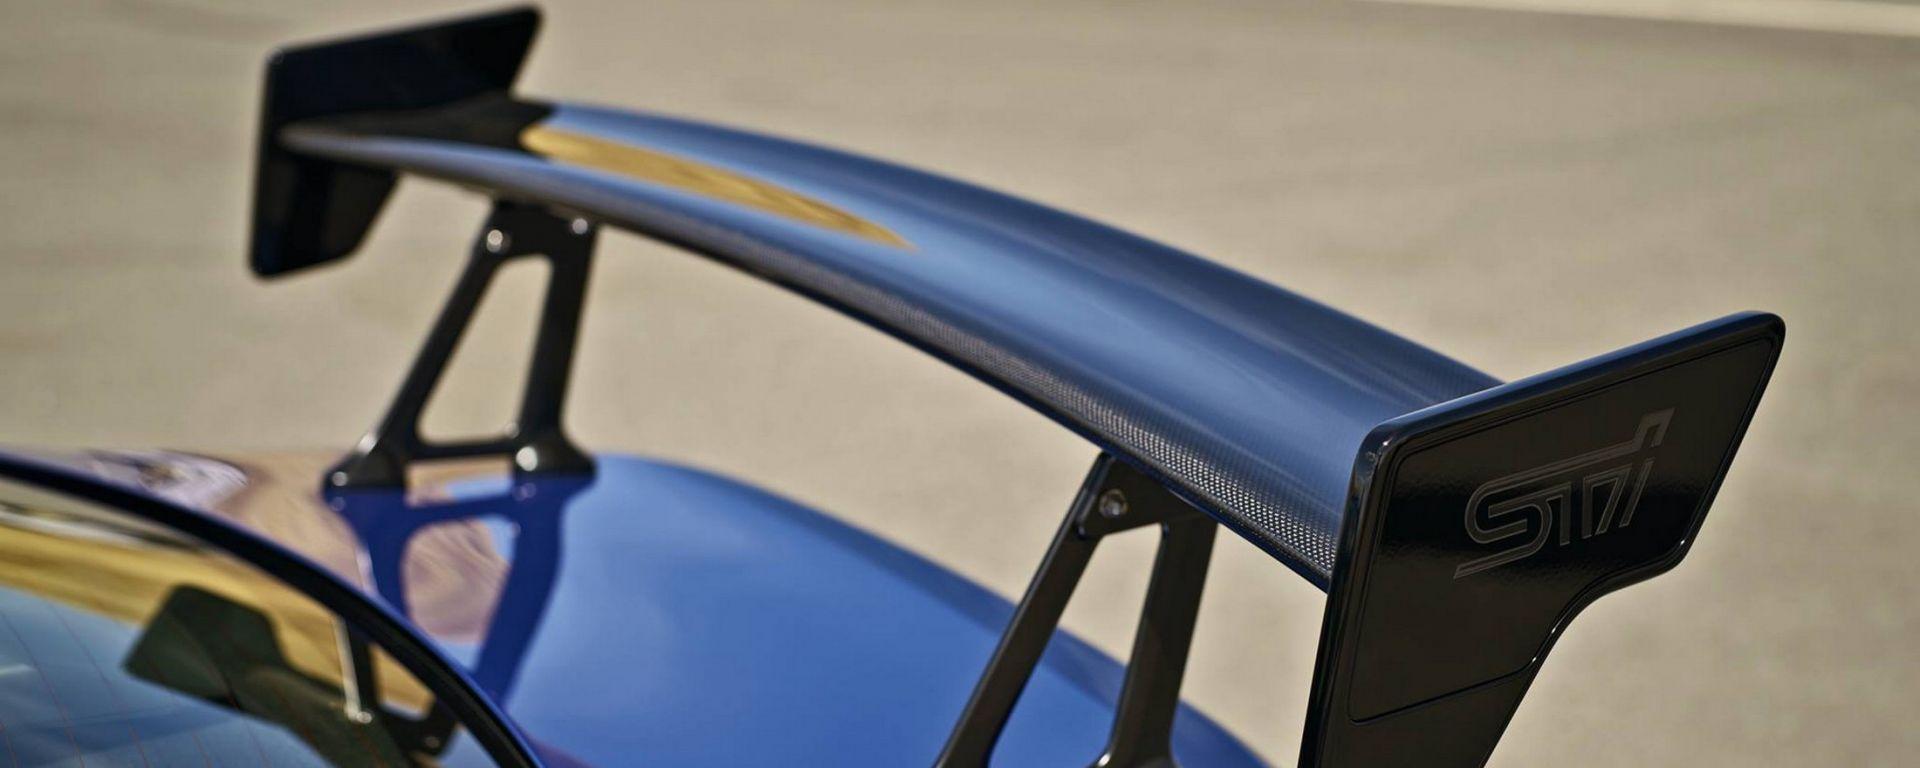 Subaru BRZ STI: la prima immagine teaser